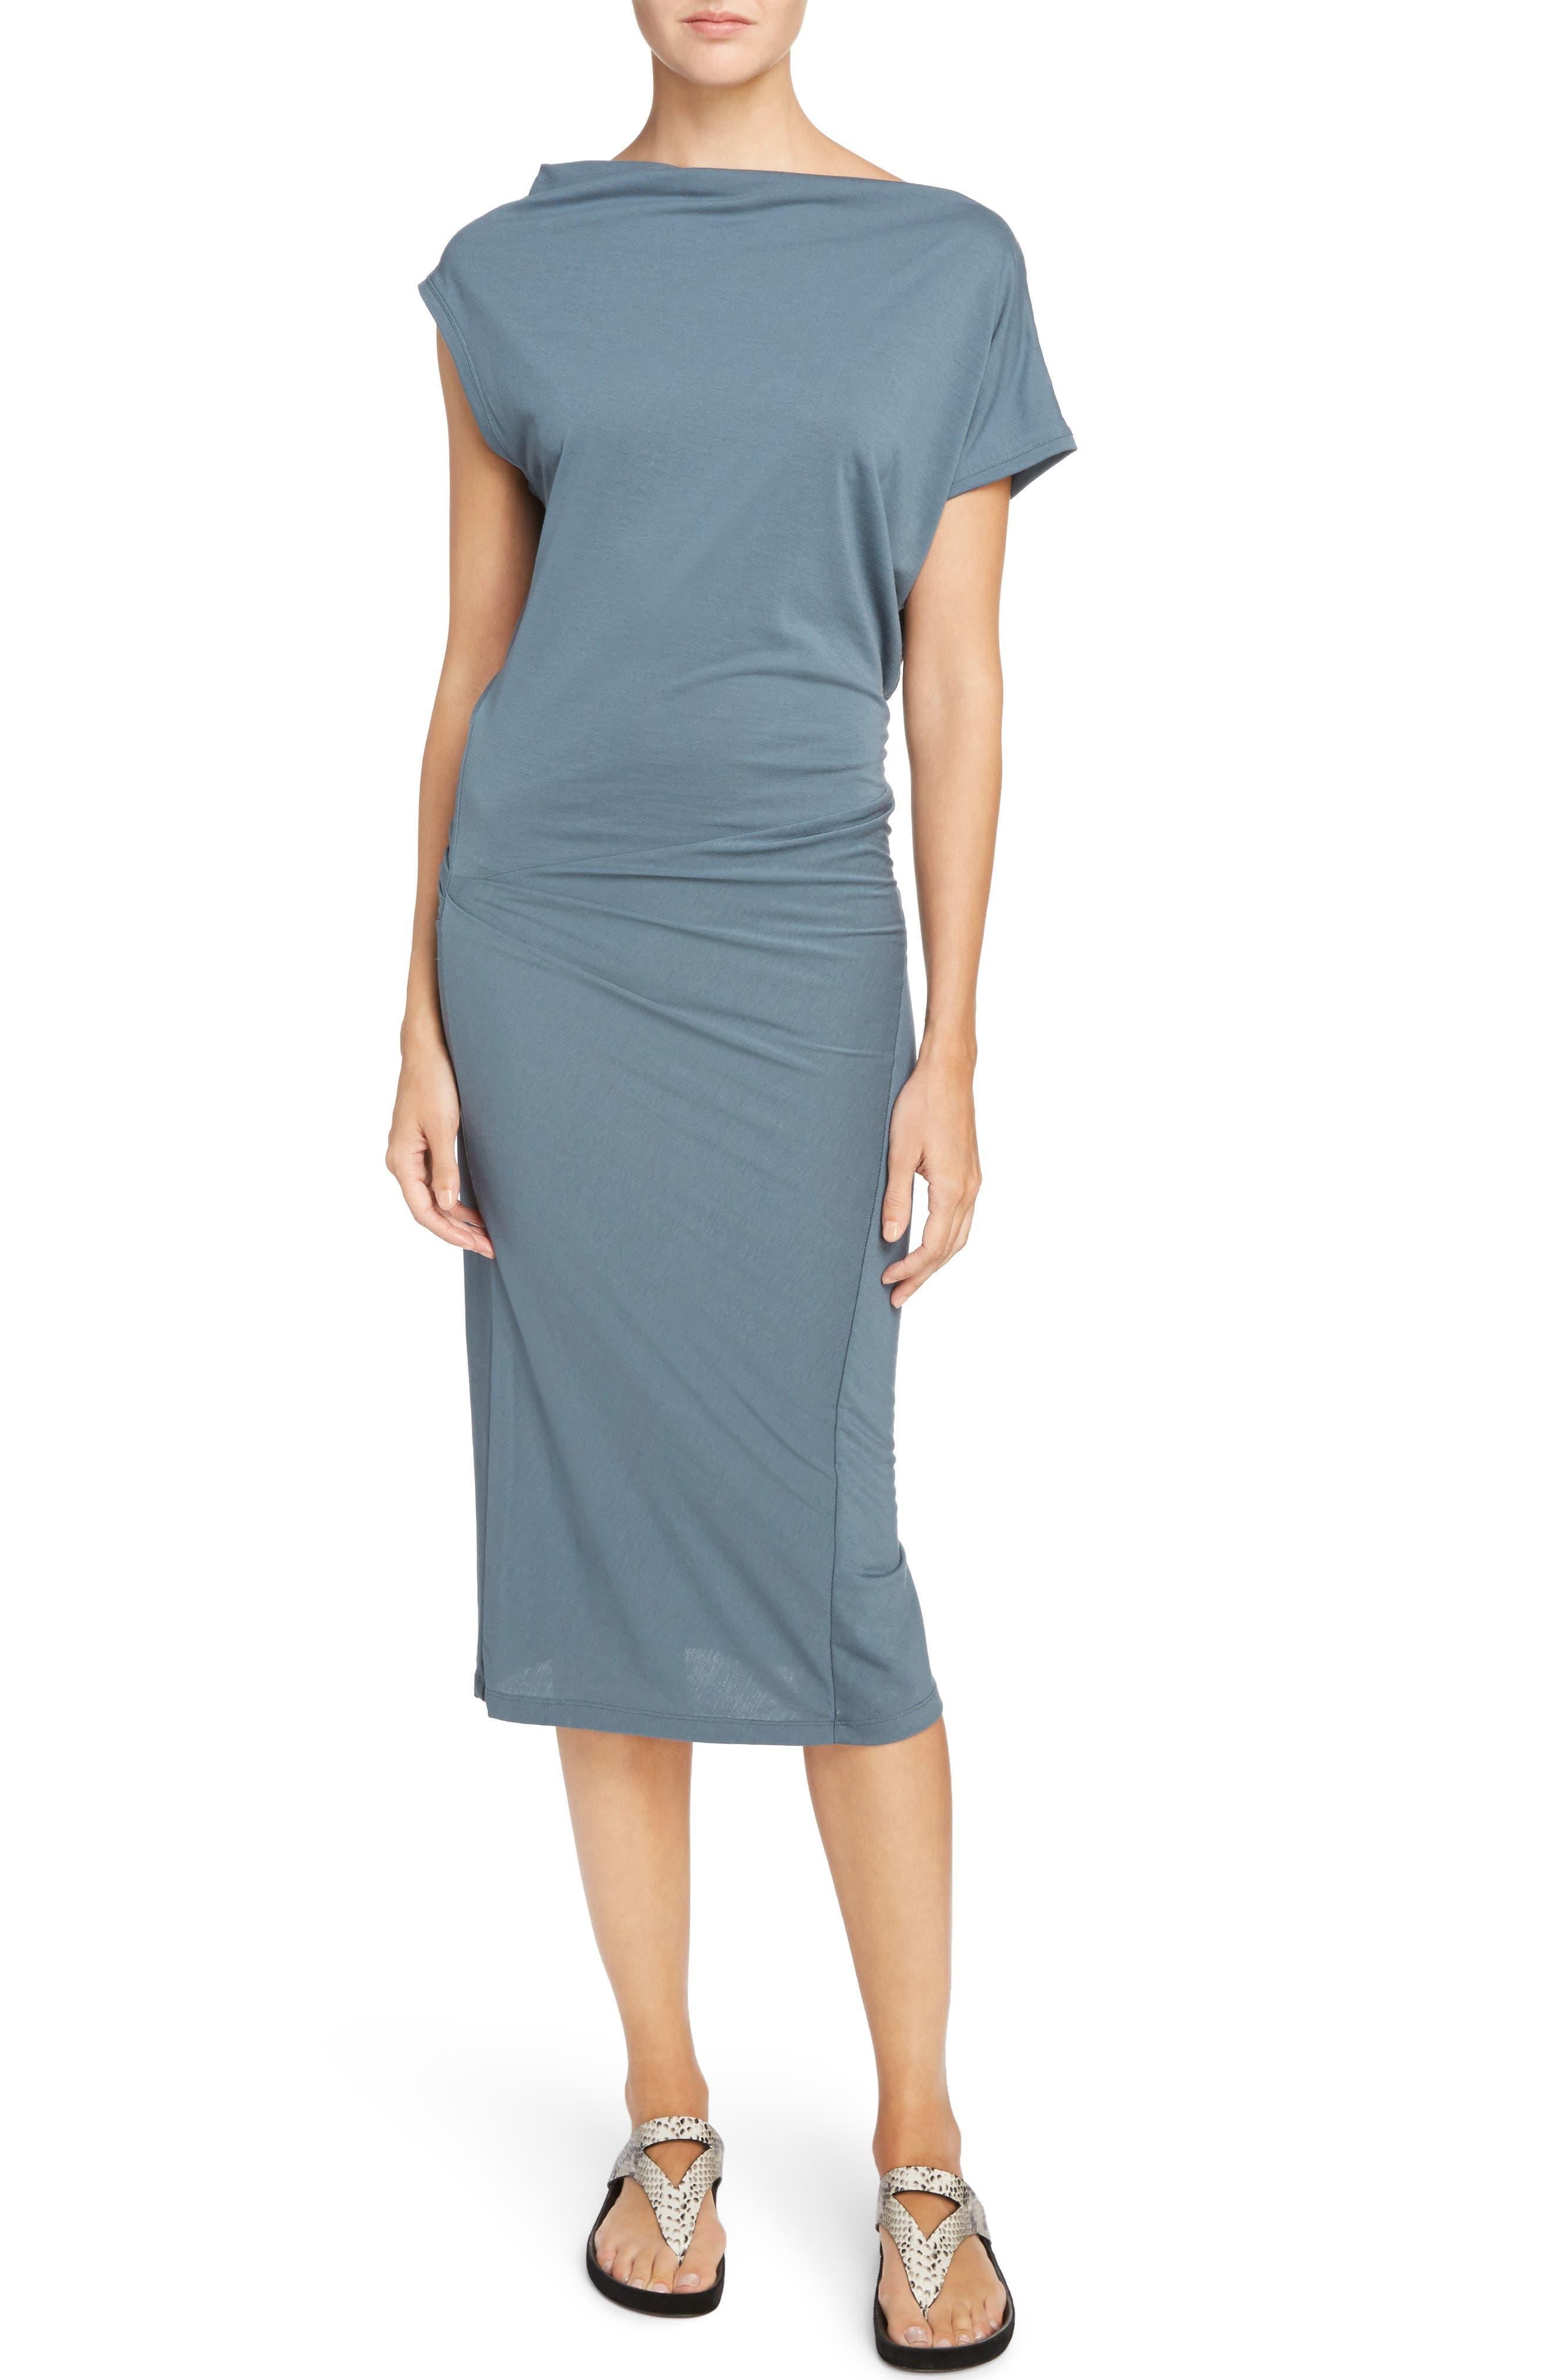 Isabel Marant Étoile Rumba Dress,                             Main thumbnail 1, color,                             Slate Blue